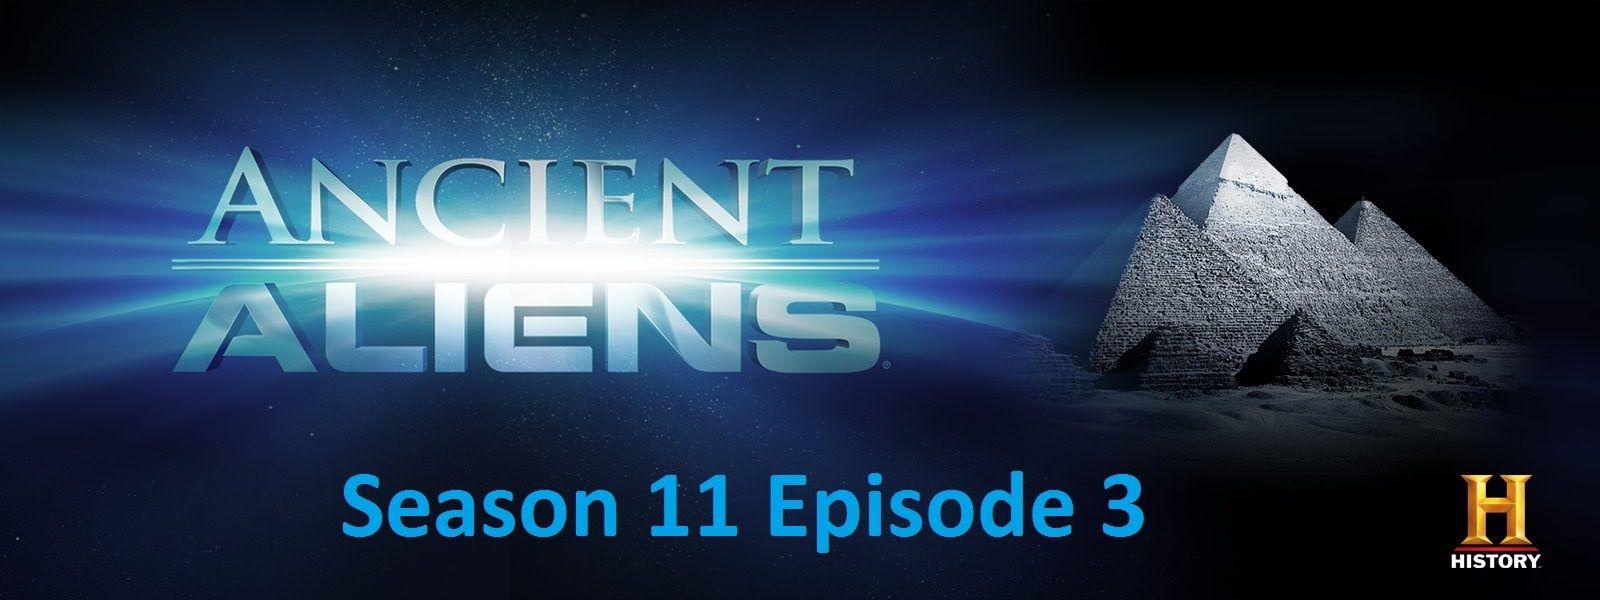 Documentary: Ancient Aliens Season 11 Episode 5 – The Visionaries – Universe – Strange day ago ○ - ufo.